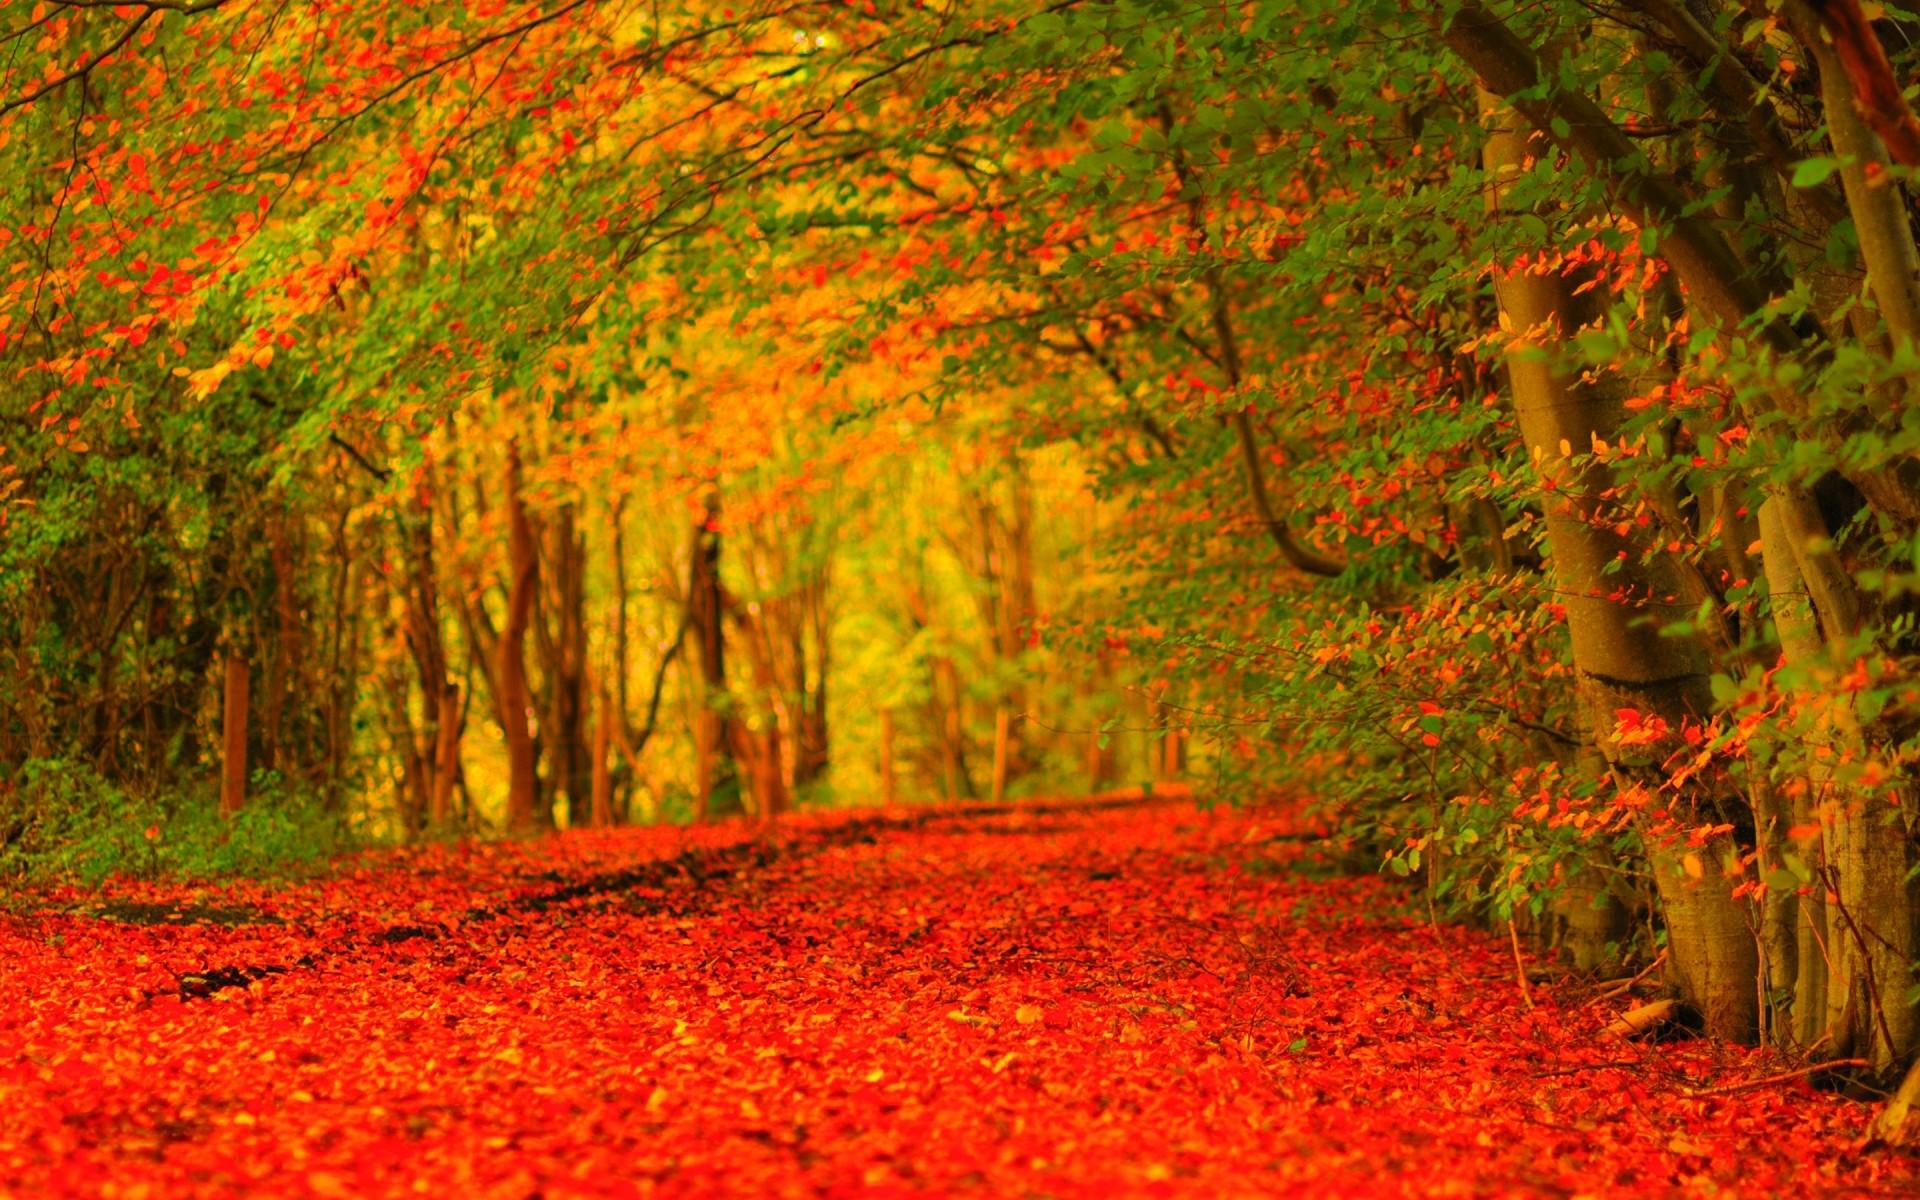 Autumn Wallpaper Widescreen – EchoMon